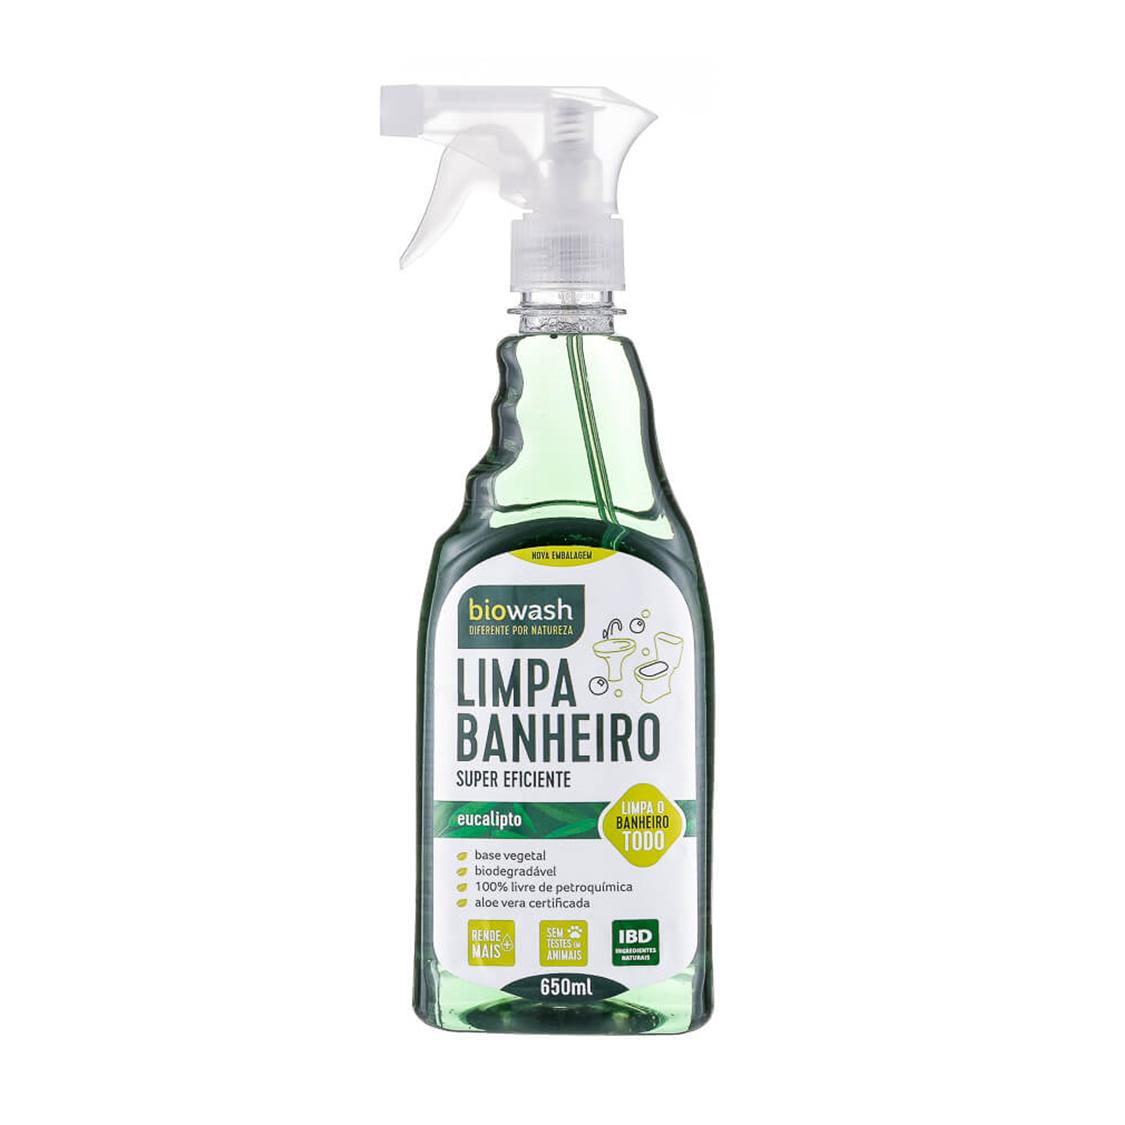 Limpa Banheiro (650ml) – Biowash